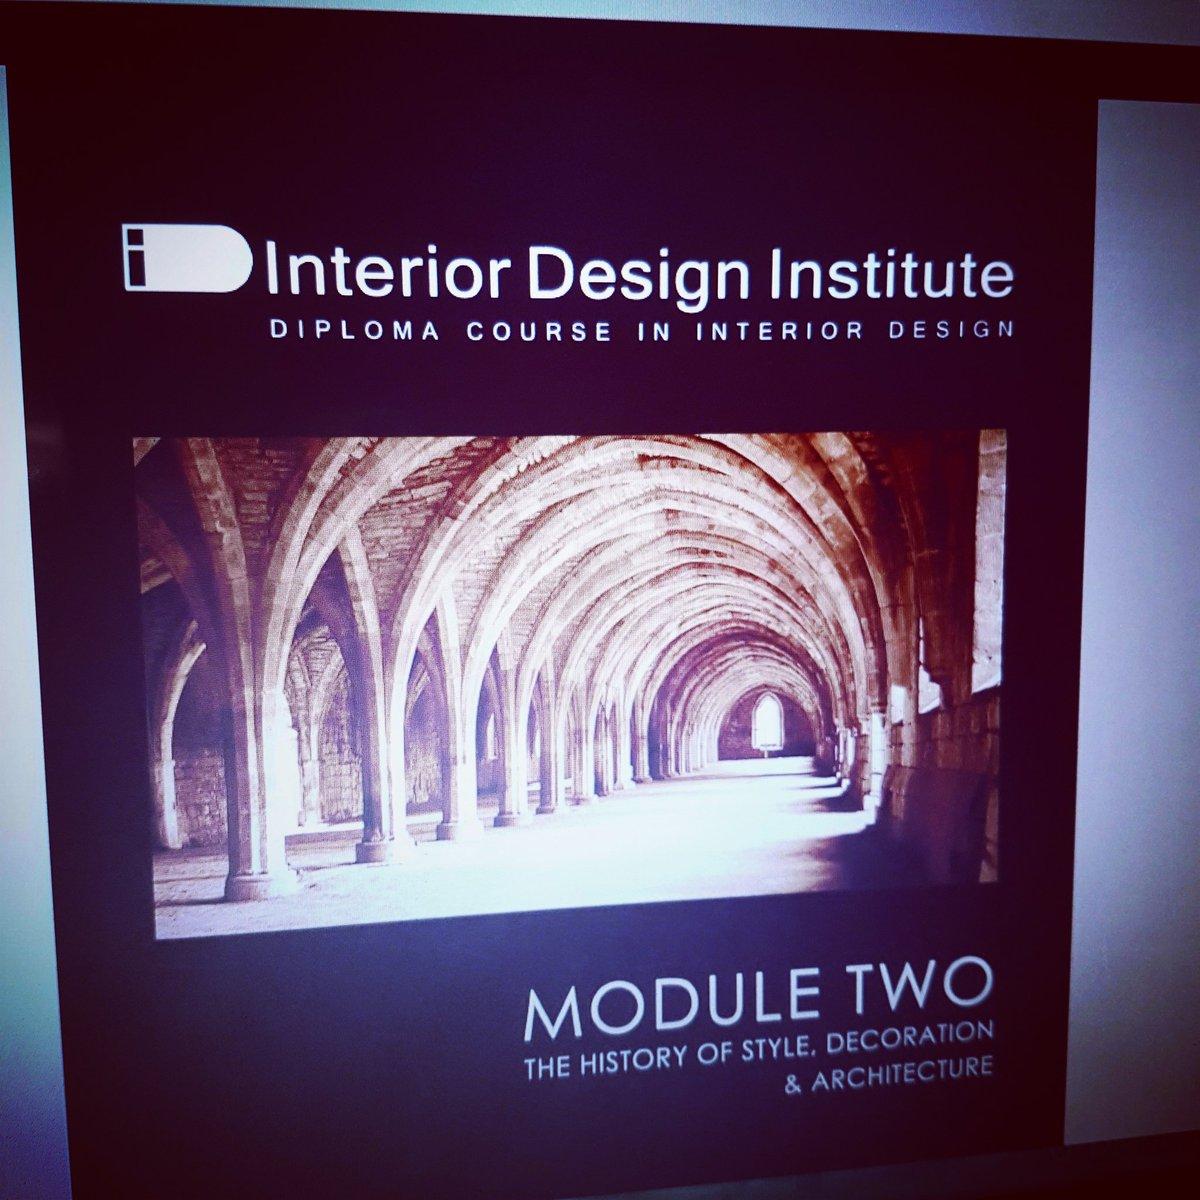 #housedesign #idistudent #3dhomeimpressions #backtoschool # Theinteriordesigninstitute #lovearchitecture #architecture  #historypic.twitter.com/OwnoBvJyh7